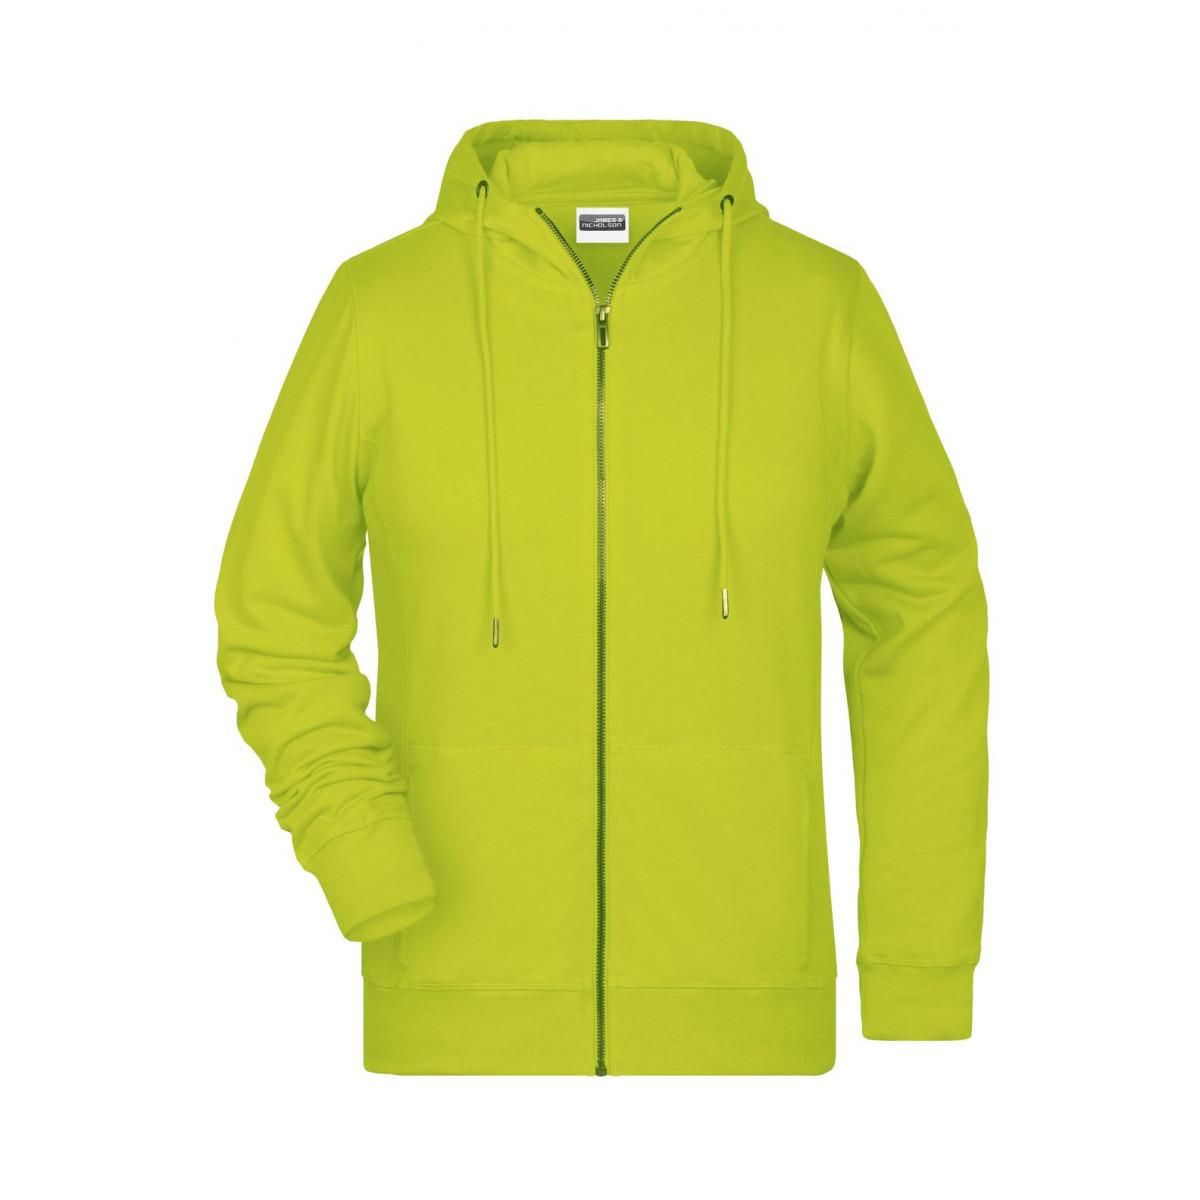 Толстовка женская 8025 Ladies Zip Hoody - Ярко-желтый